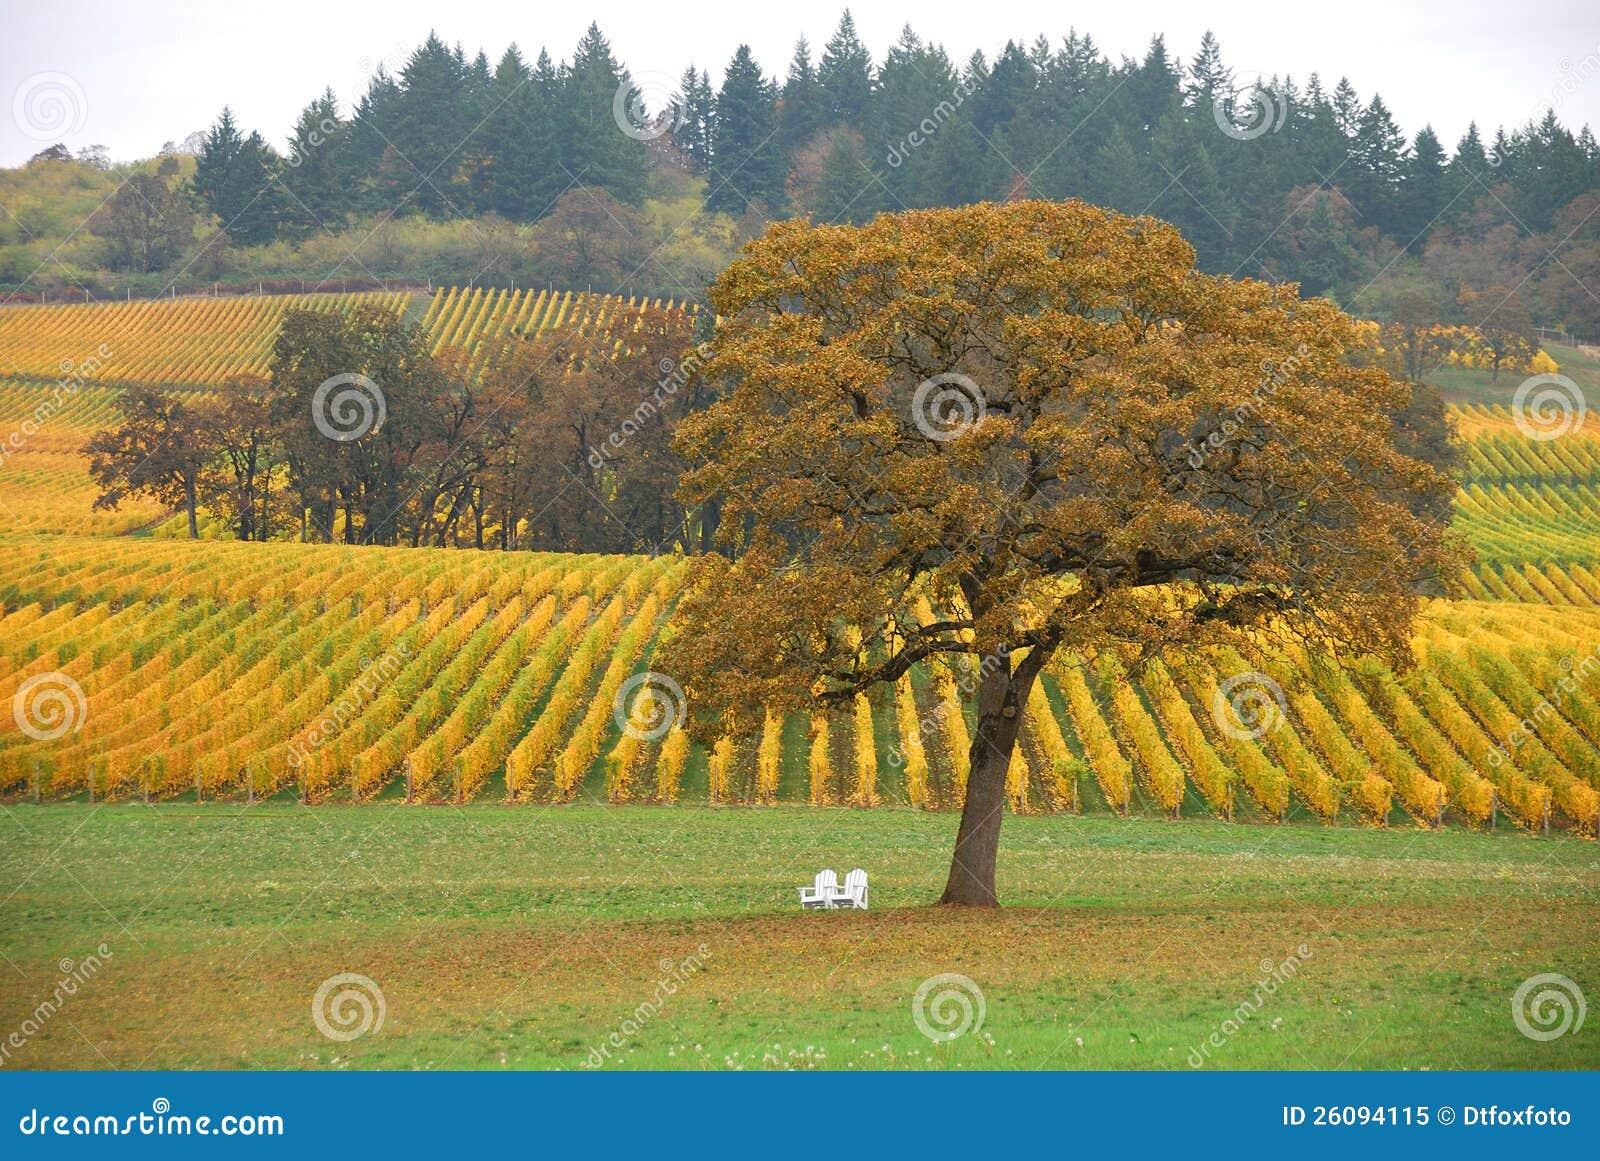 TreeVineyard